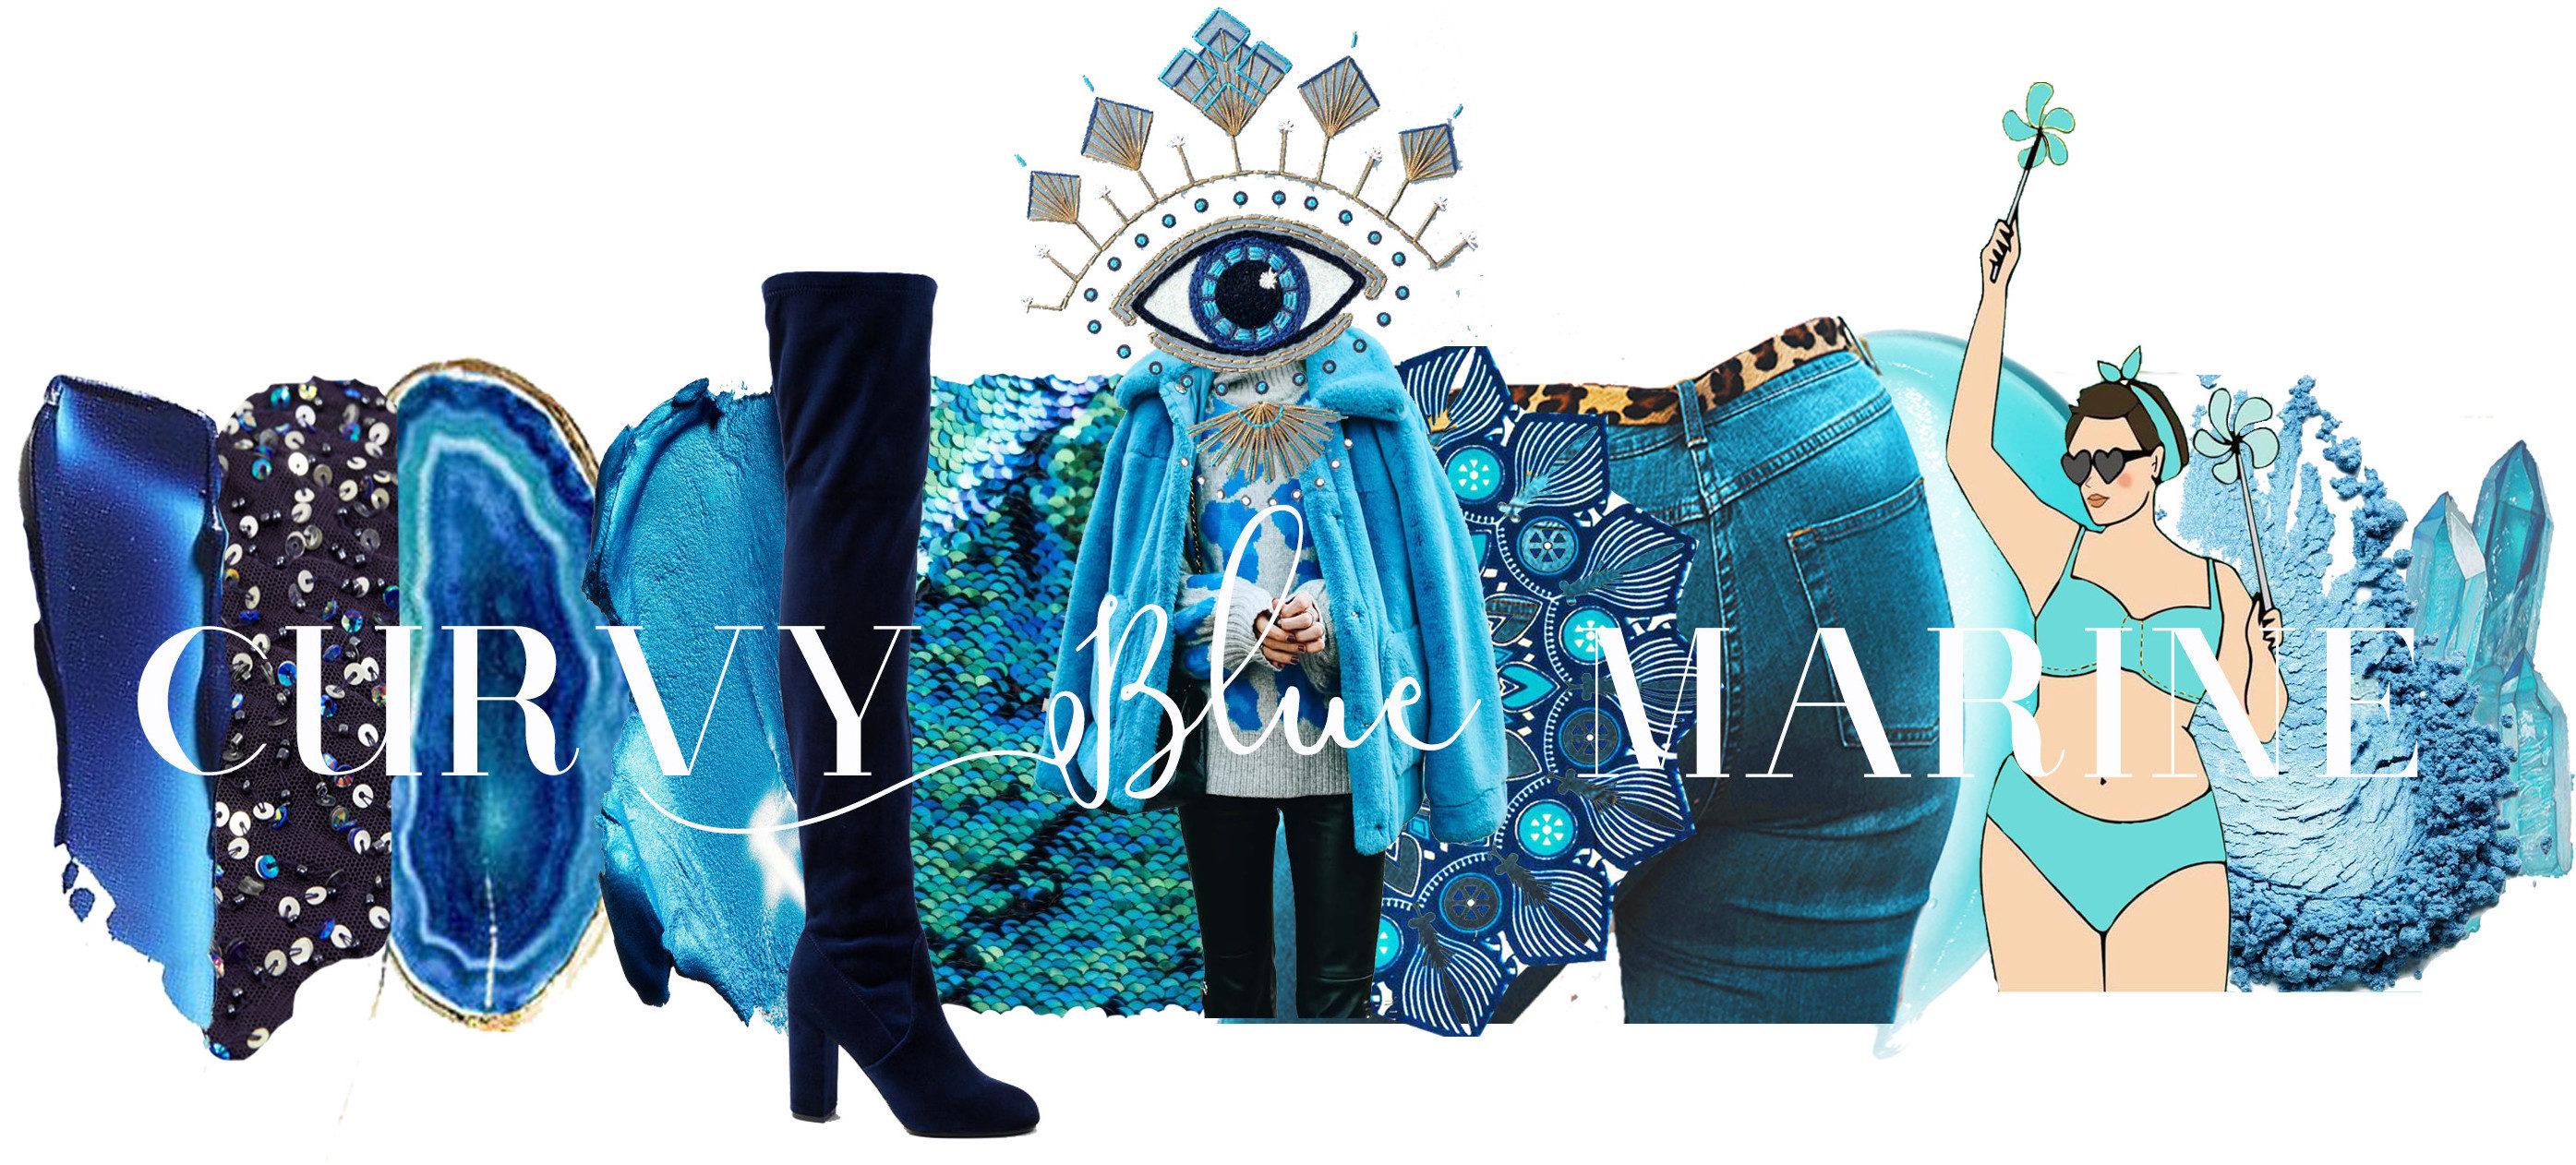 Curvy Blue Marine